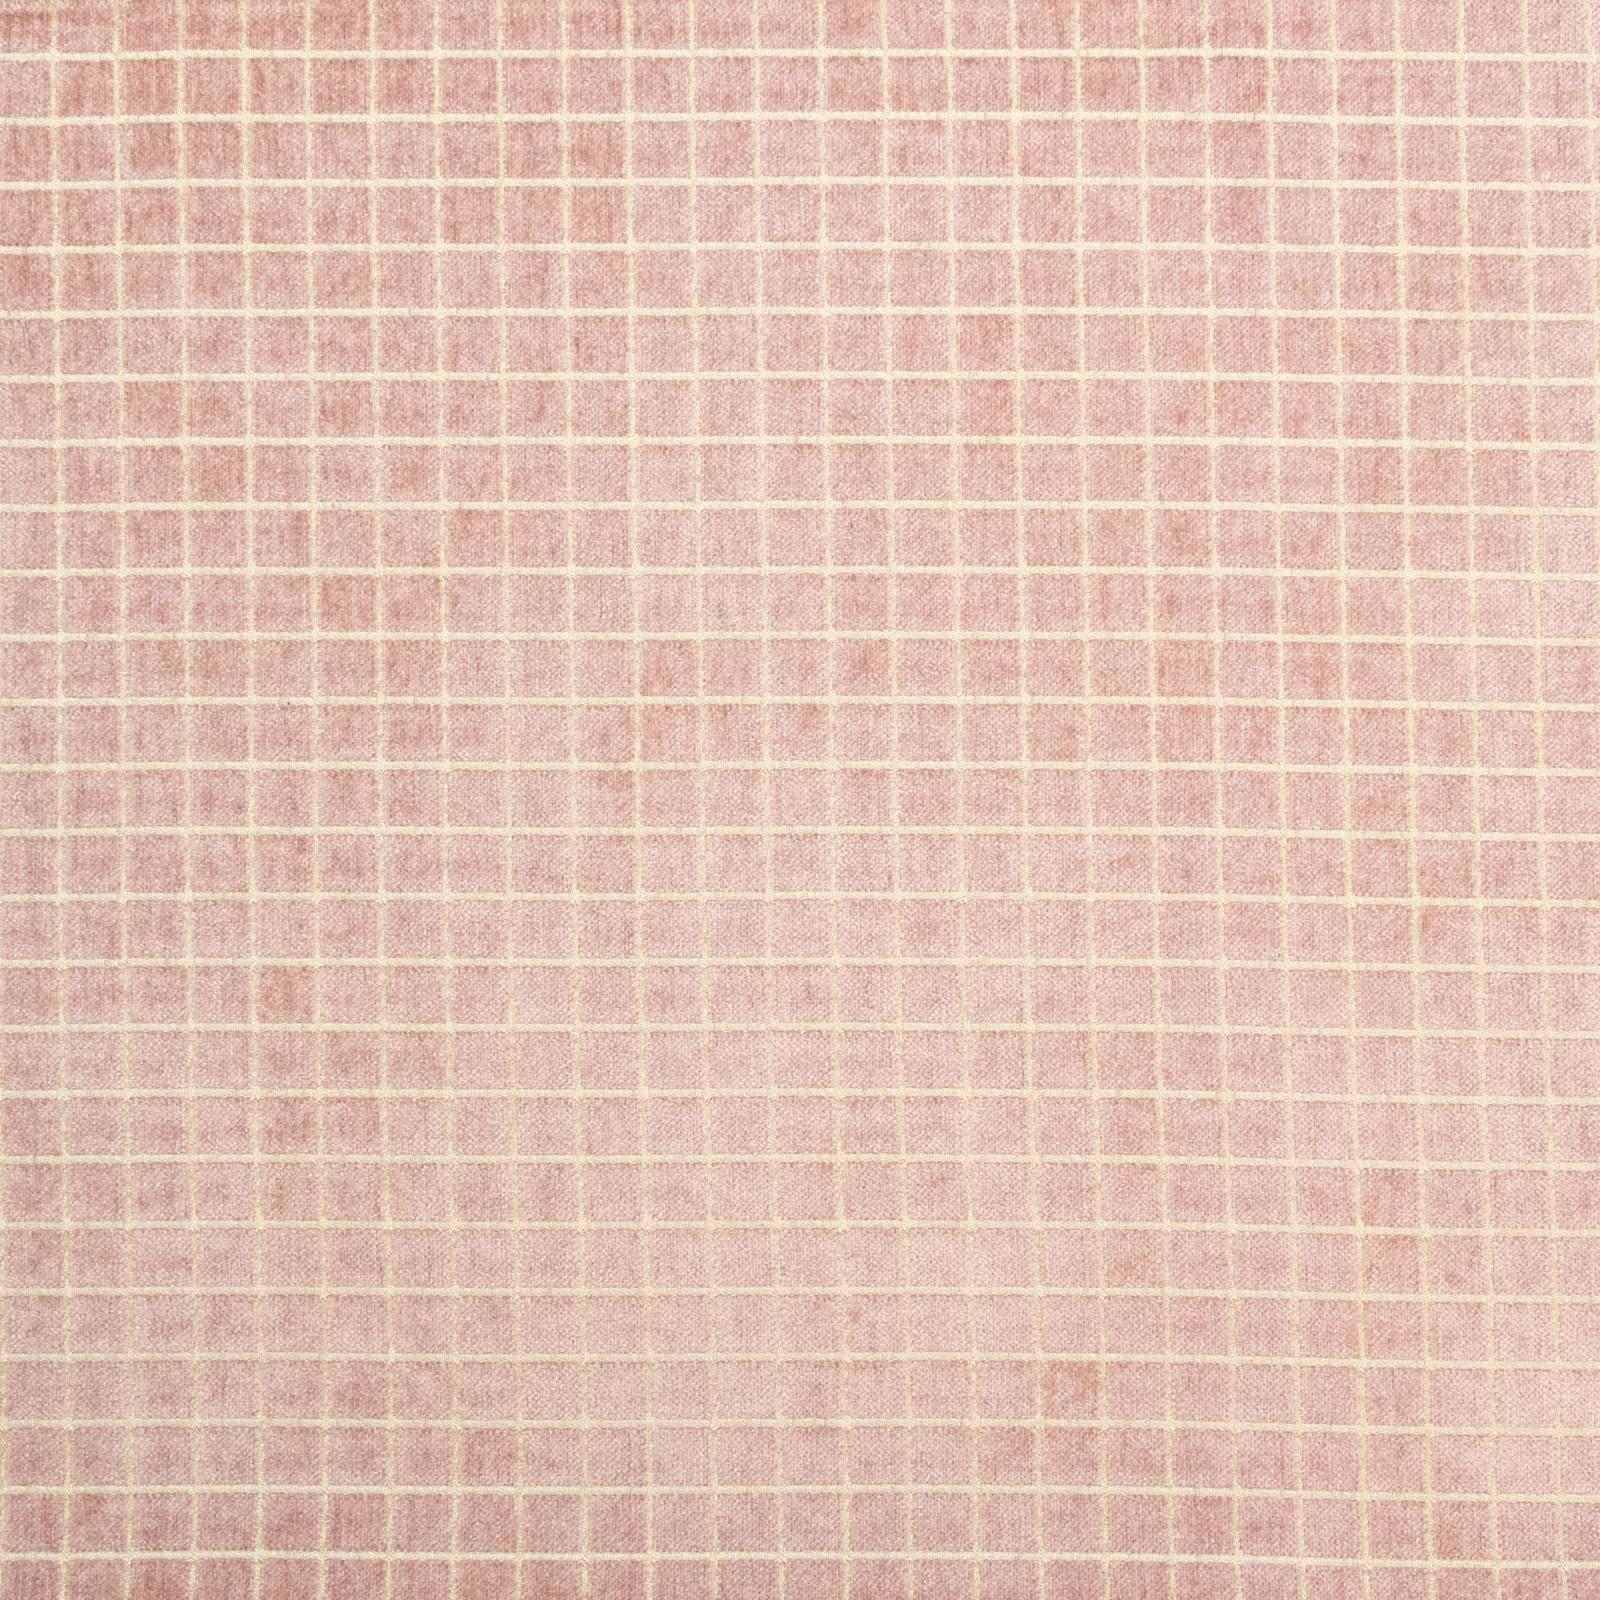 B8229 Nude Greenhouse Fabrics